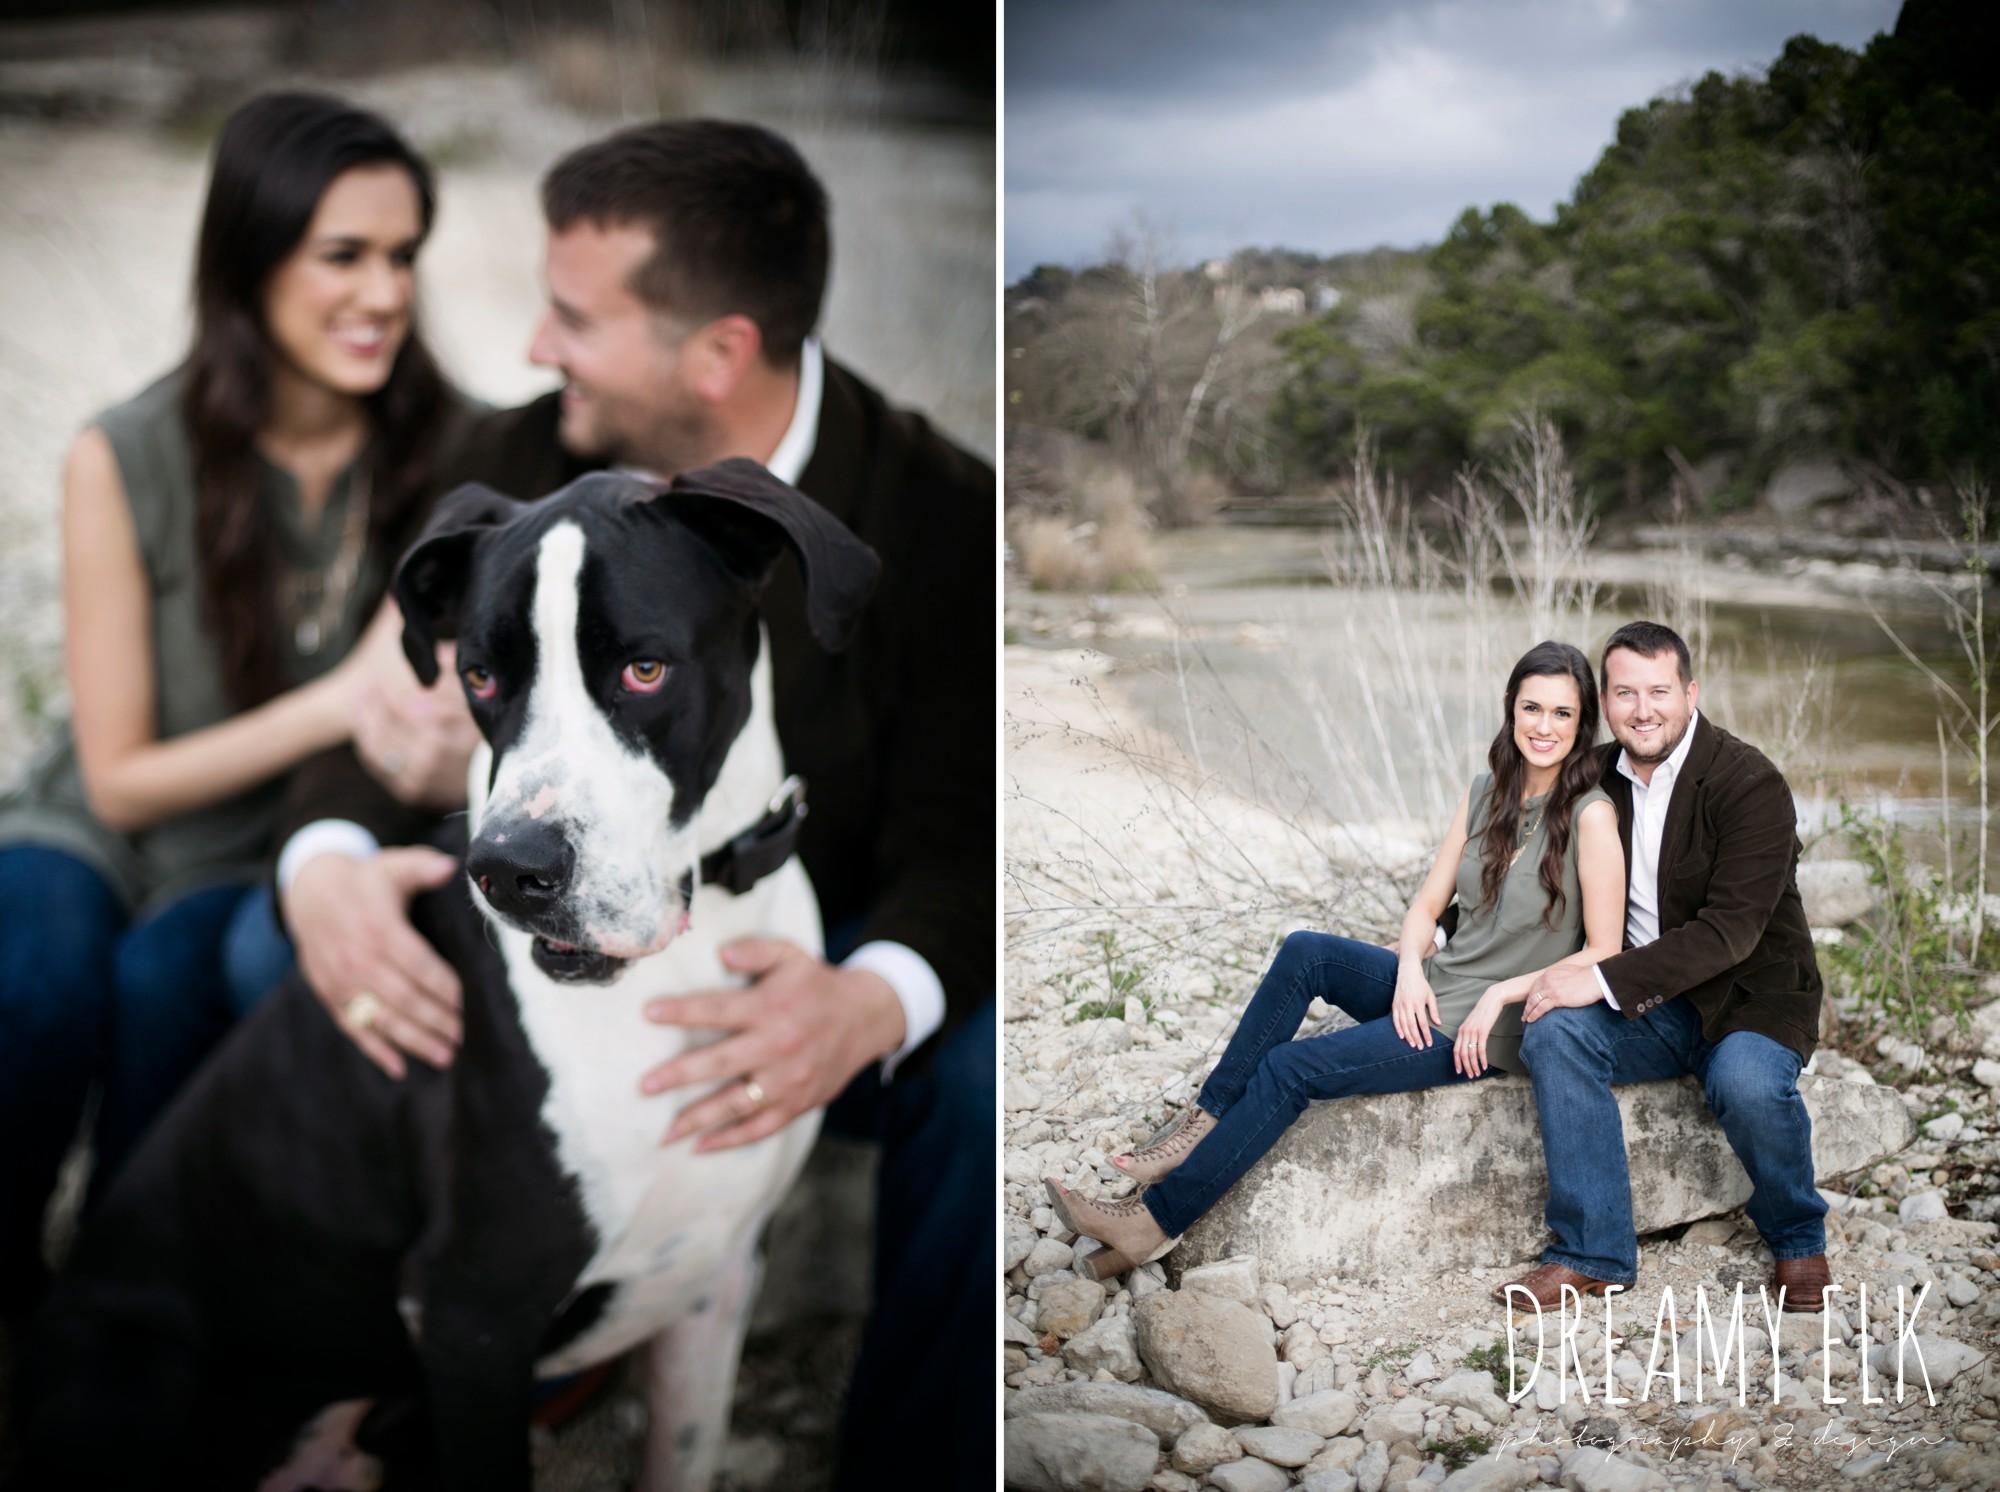 great dane, fun winter anniversary photo shoot with dog, bull creek park, austin, texas {dreamy elk photography and design}